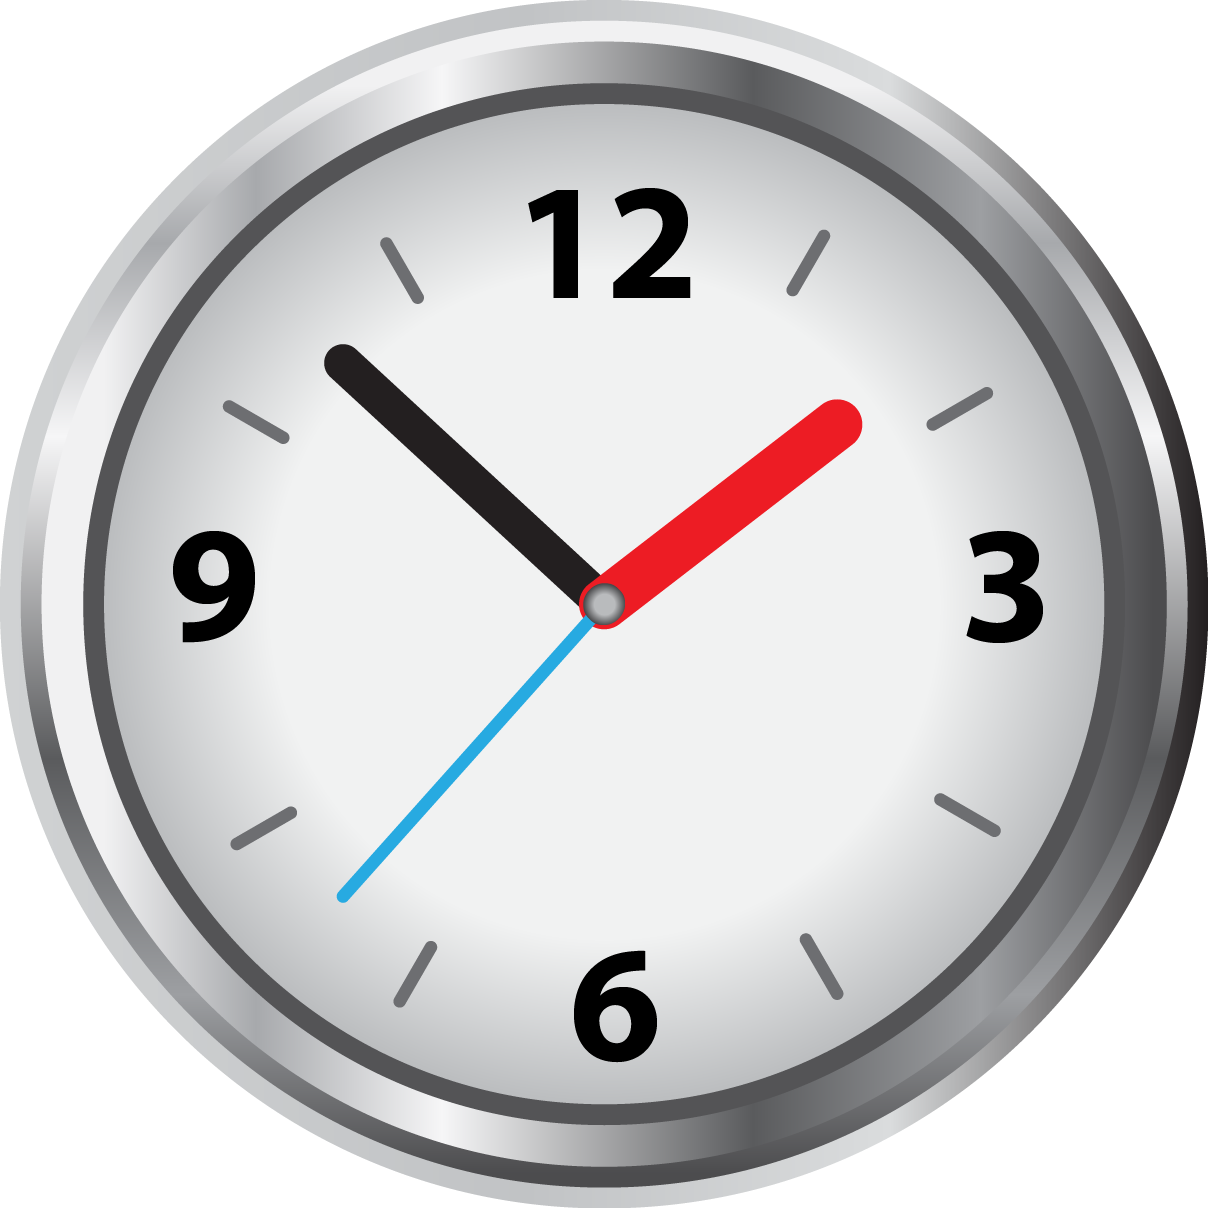 Clock Face - Blank Analog Clock Face - (1208x1208) Png